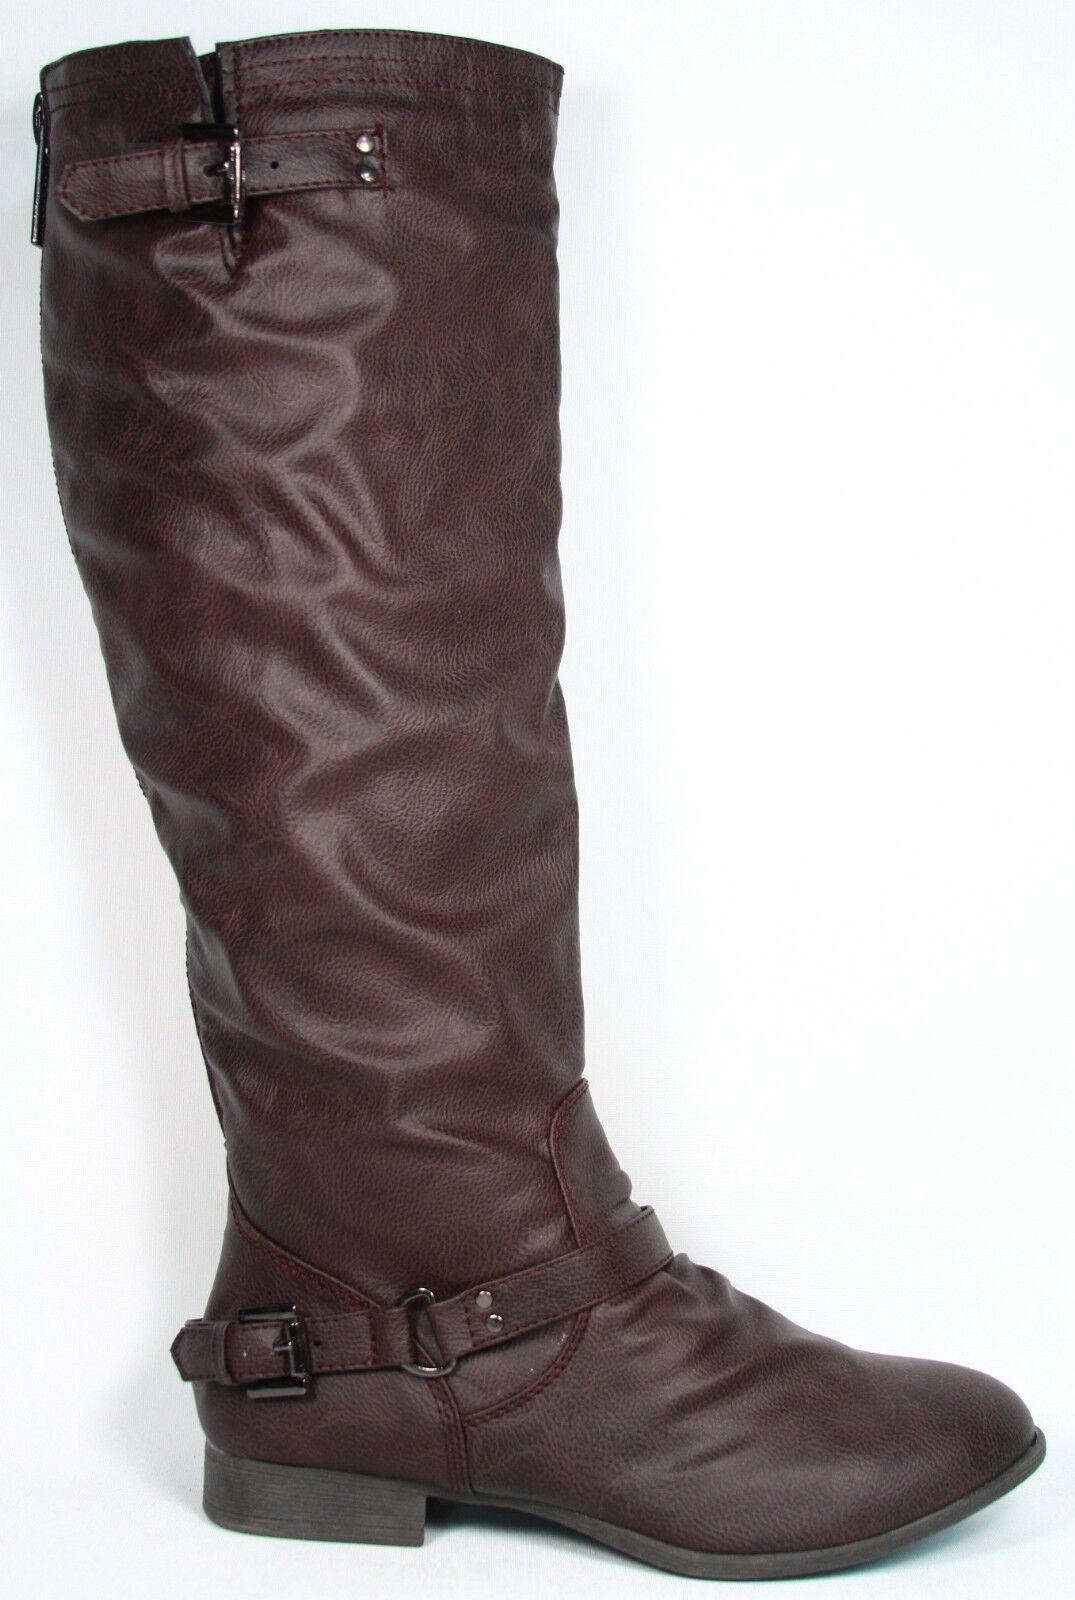 NEW  Women's Zipper Military Low Flat Heel  Buckle Riding Knee High Boot  Shoes